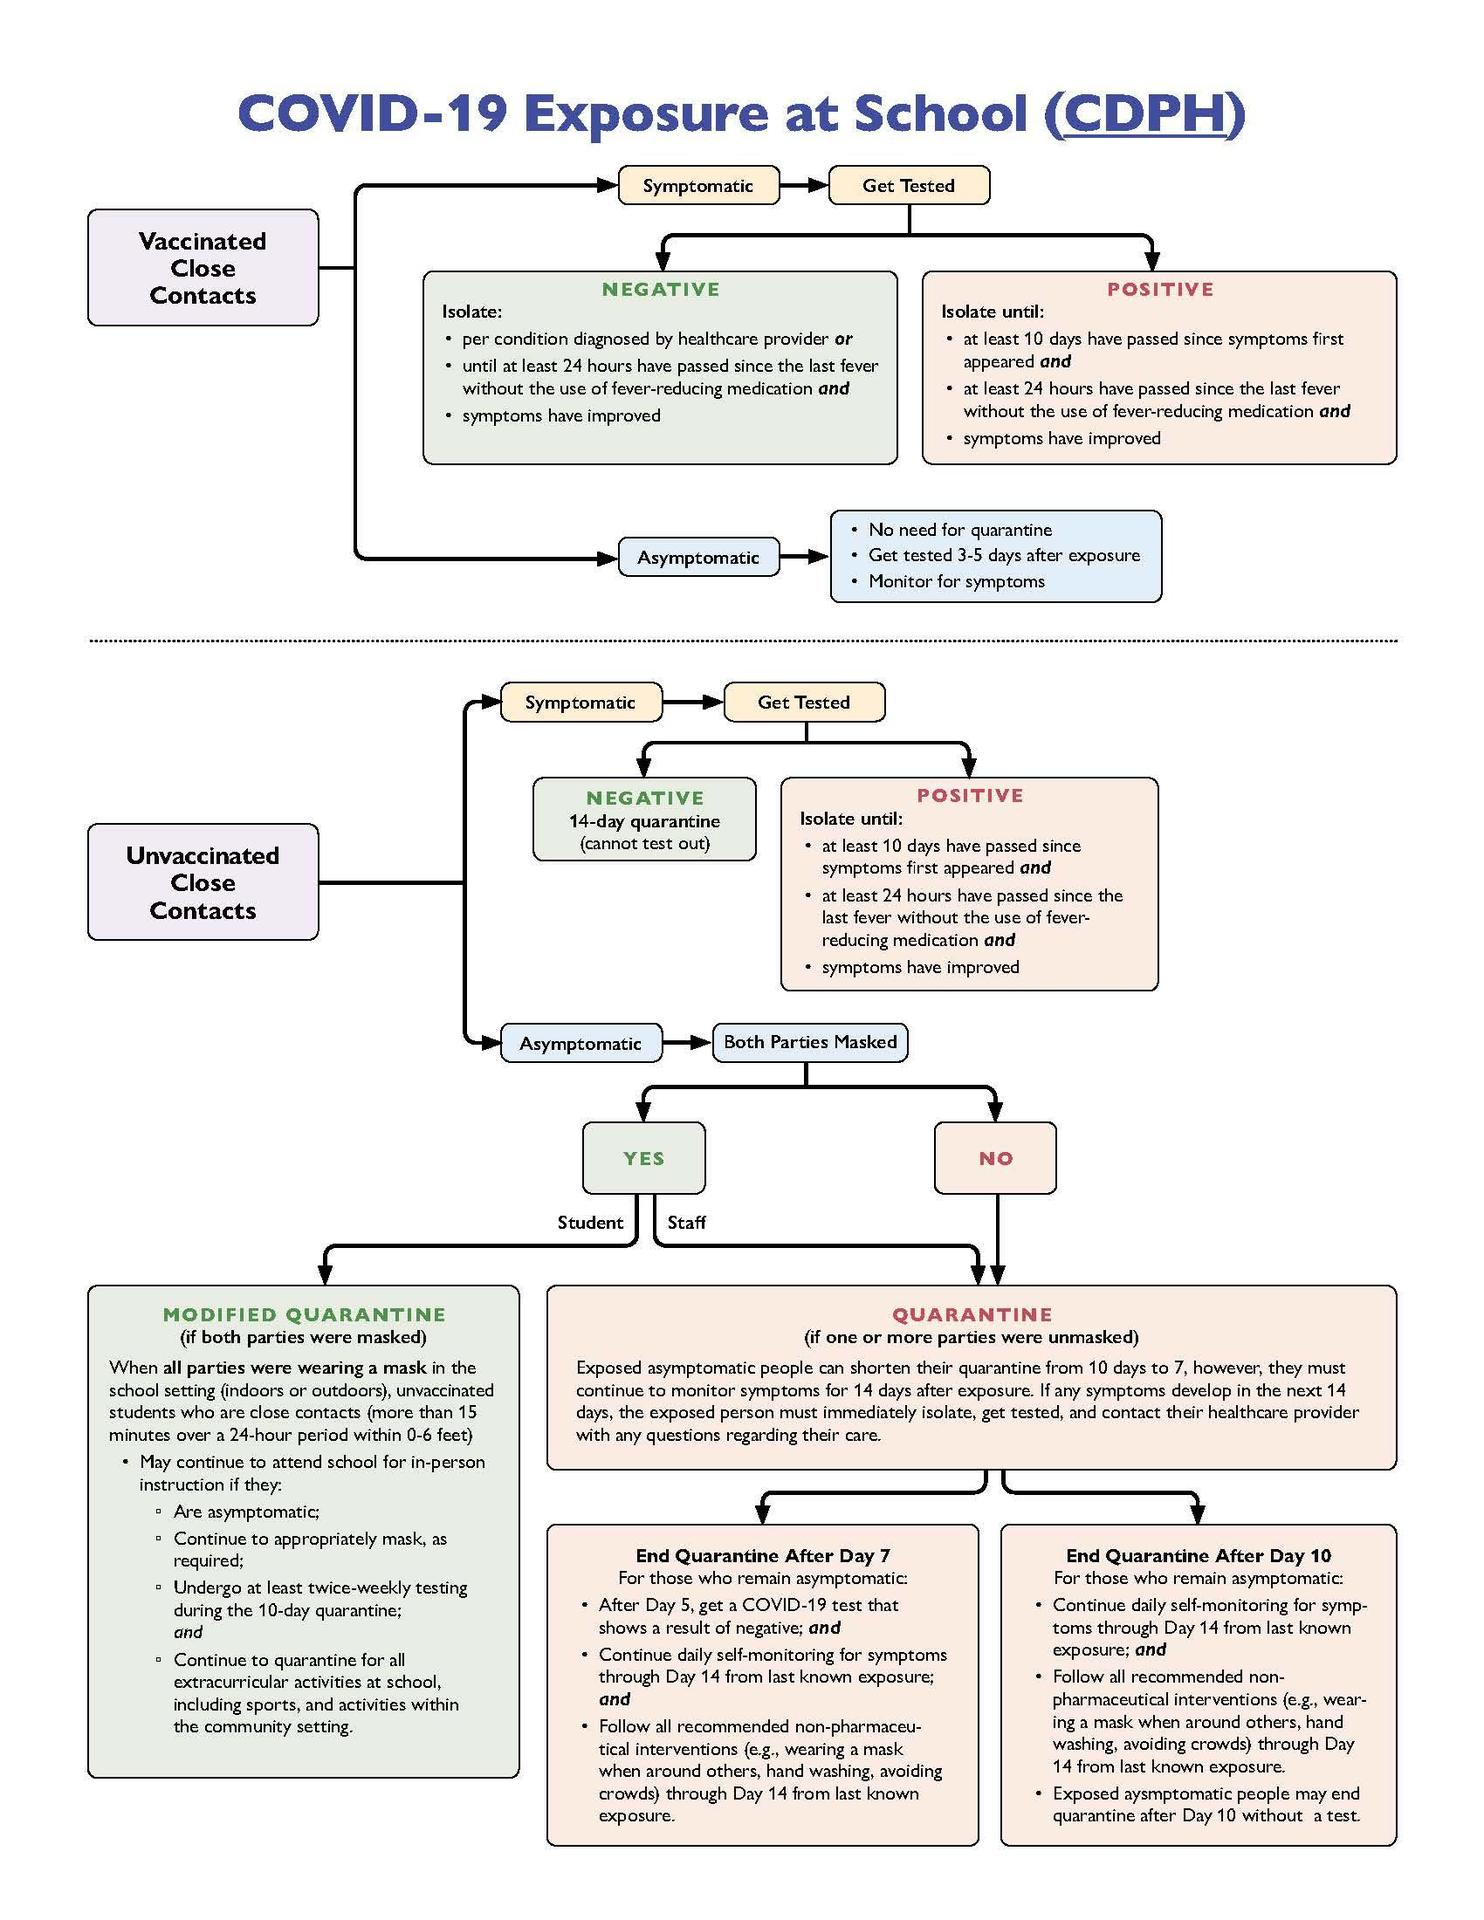 COVID-19 Exposure at School (CDPH) Chart